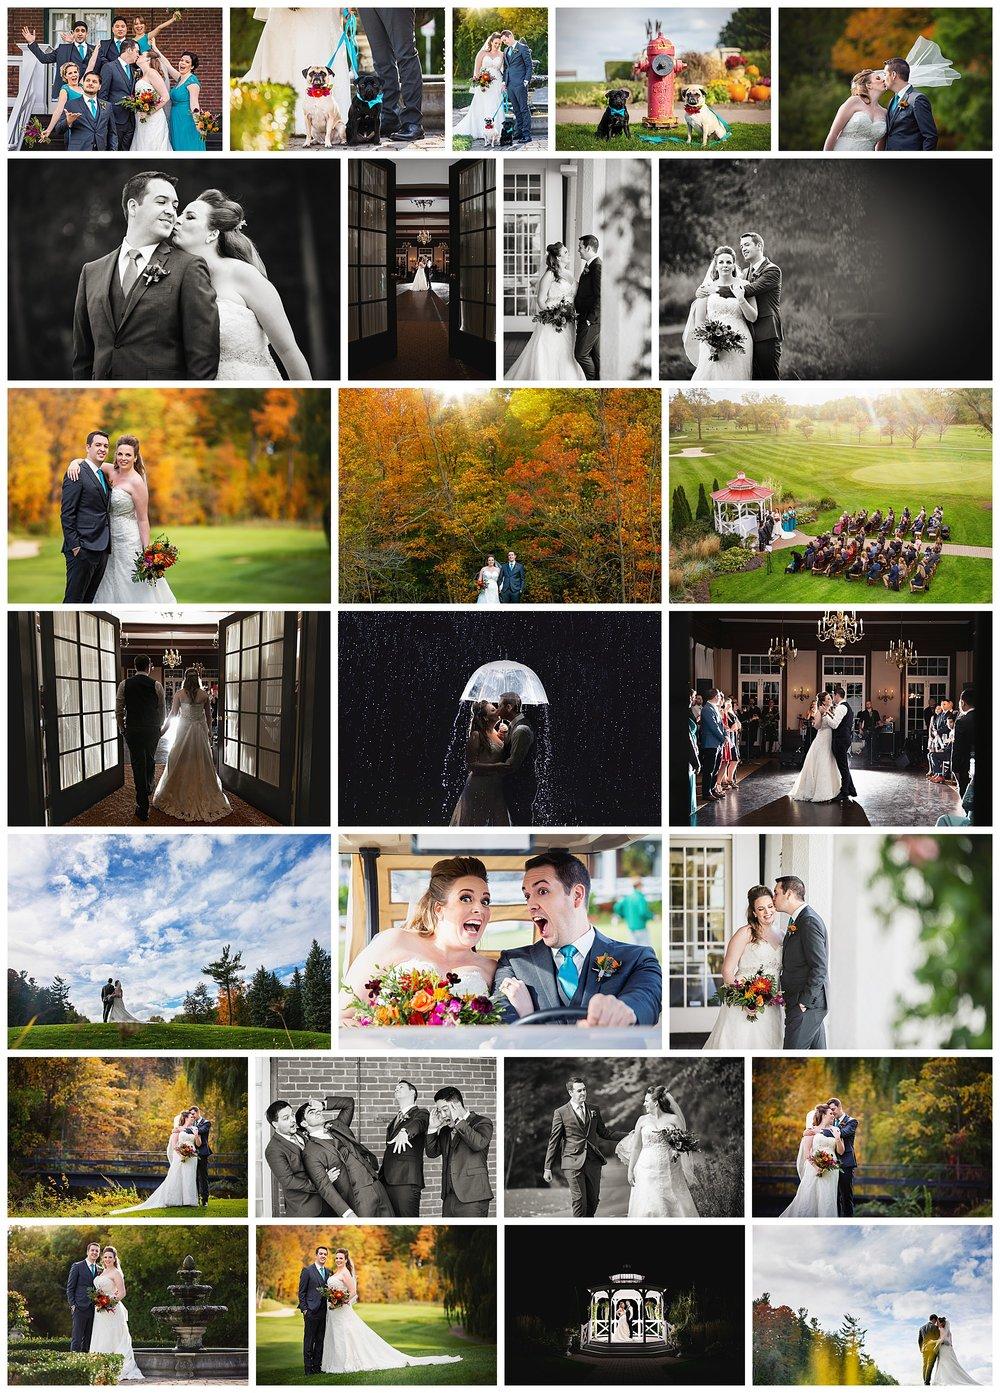 Scarboro Golf & Country Club, Scarborough, Ontario wedding photos by VanDaele & Russell